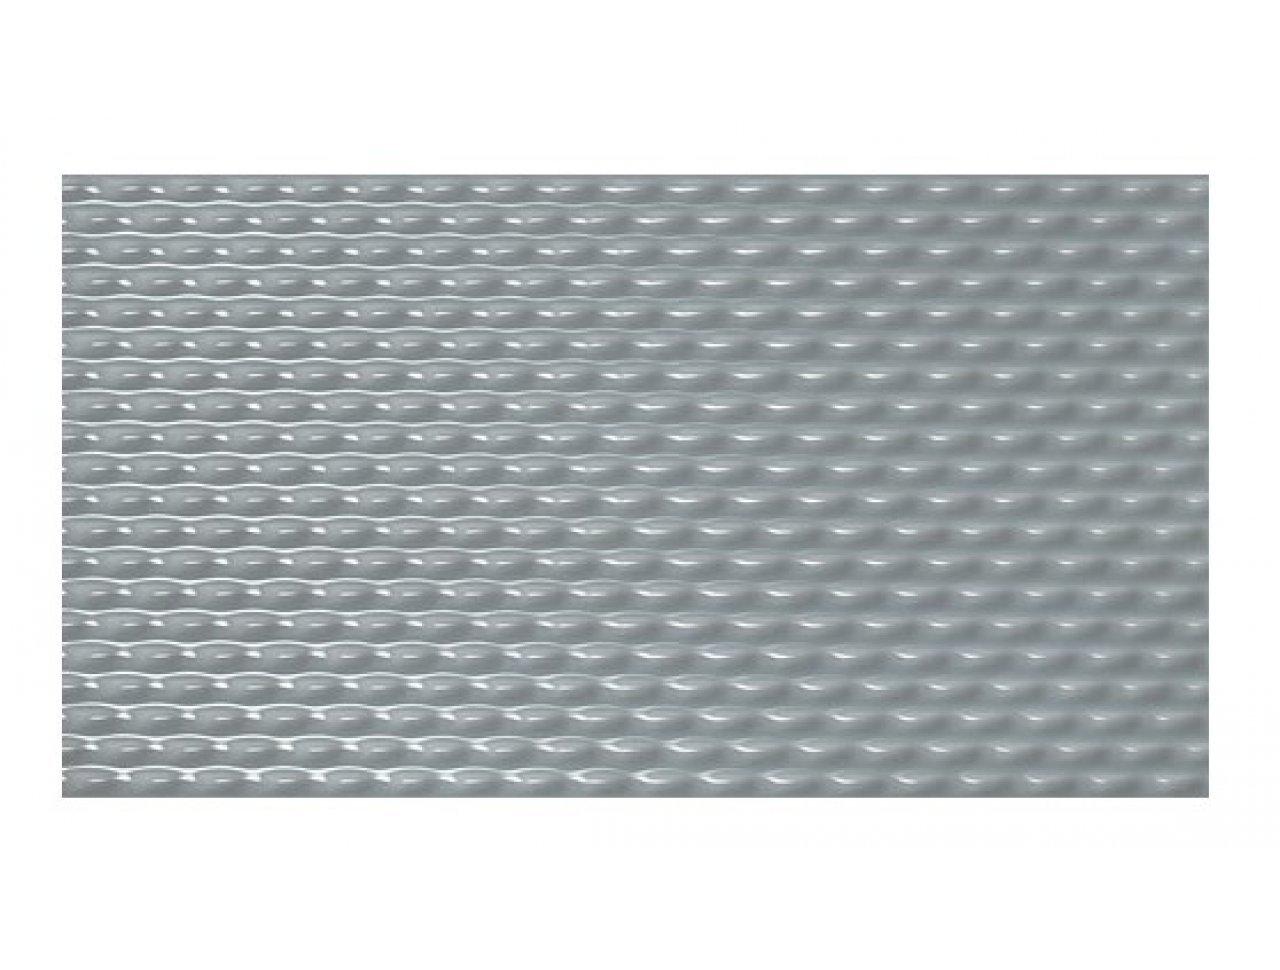 Настенная плитка FAP Frame Knot Sky 30.5 x 56 см, Арт. fLEM